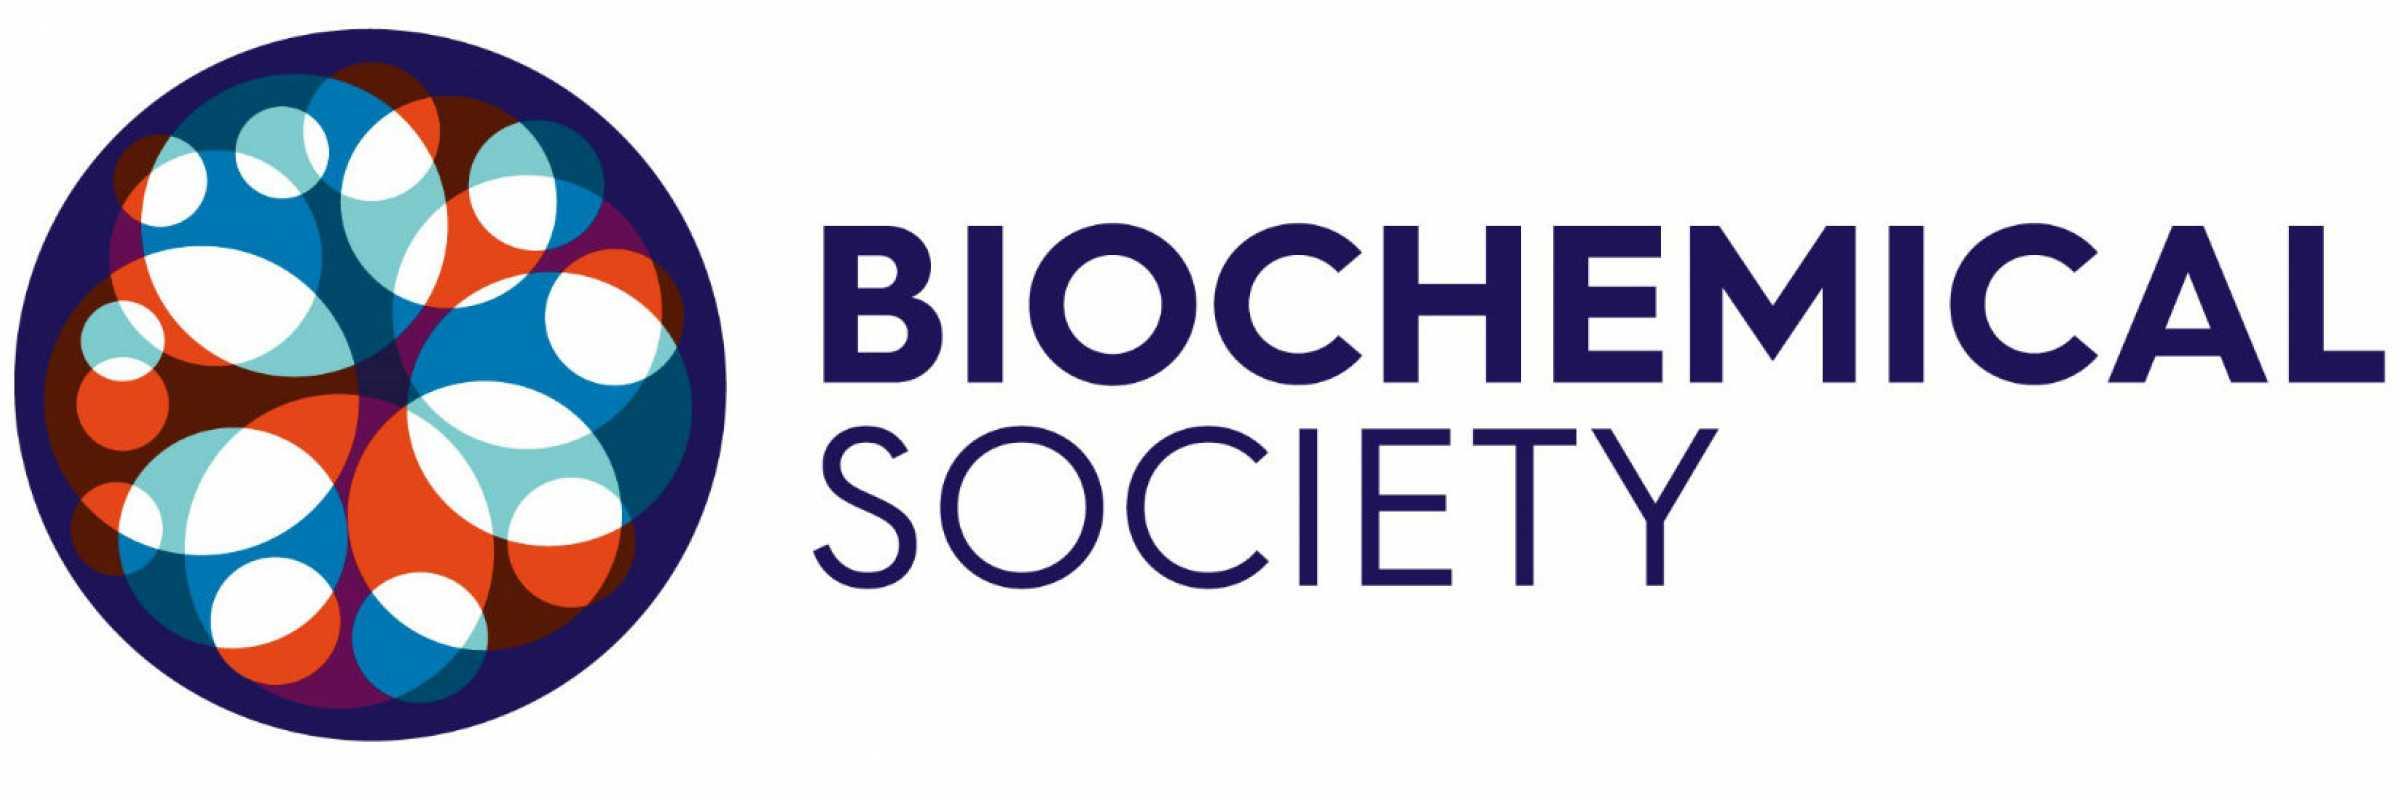 biochemical.jpg